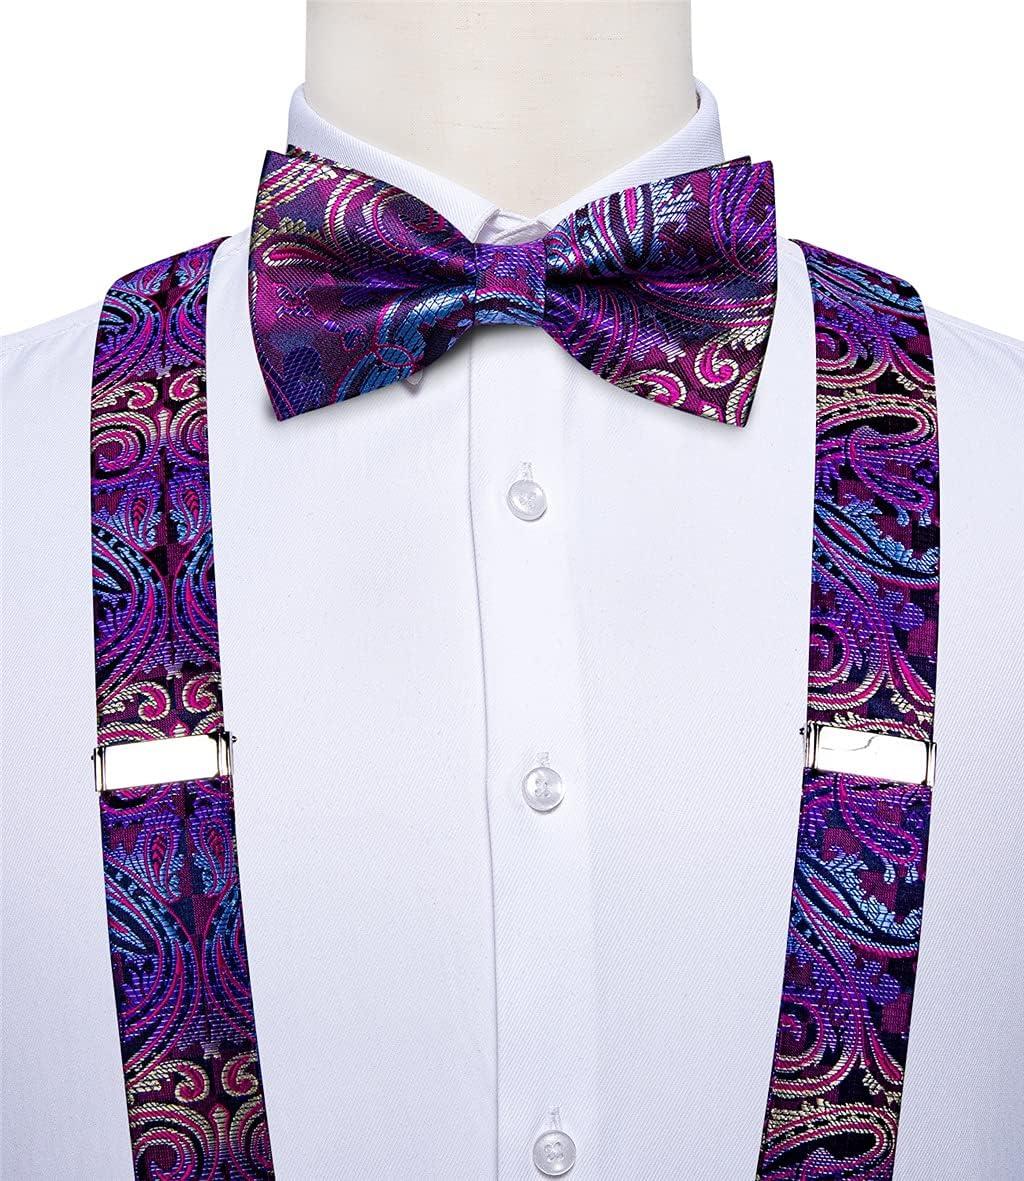 HLDETH Purple Floral Men's Suspenders Bow Tie Set Elastic Y-Back 6 Clips Braces Wedding Party Accessories Suspenders (Color : A, Size : Adjustable)